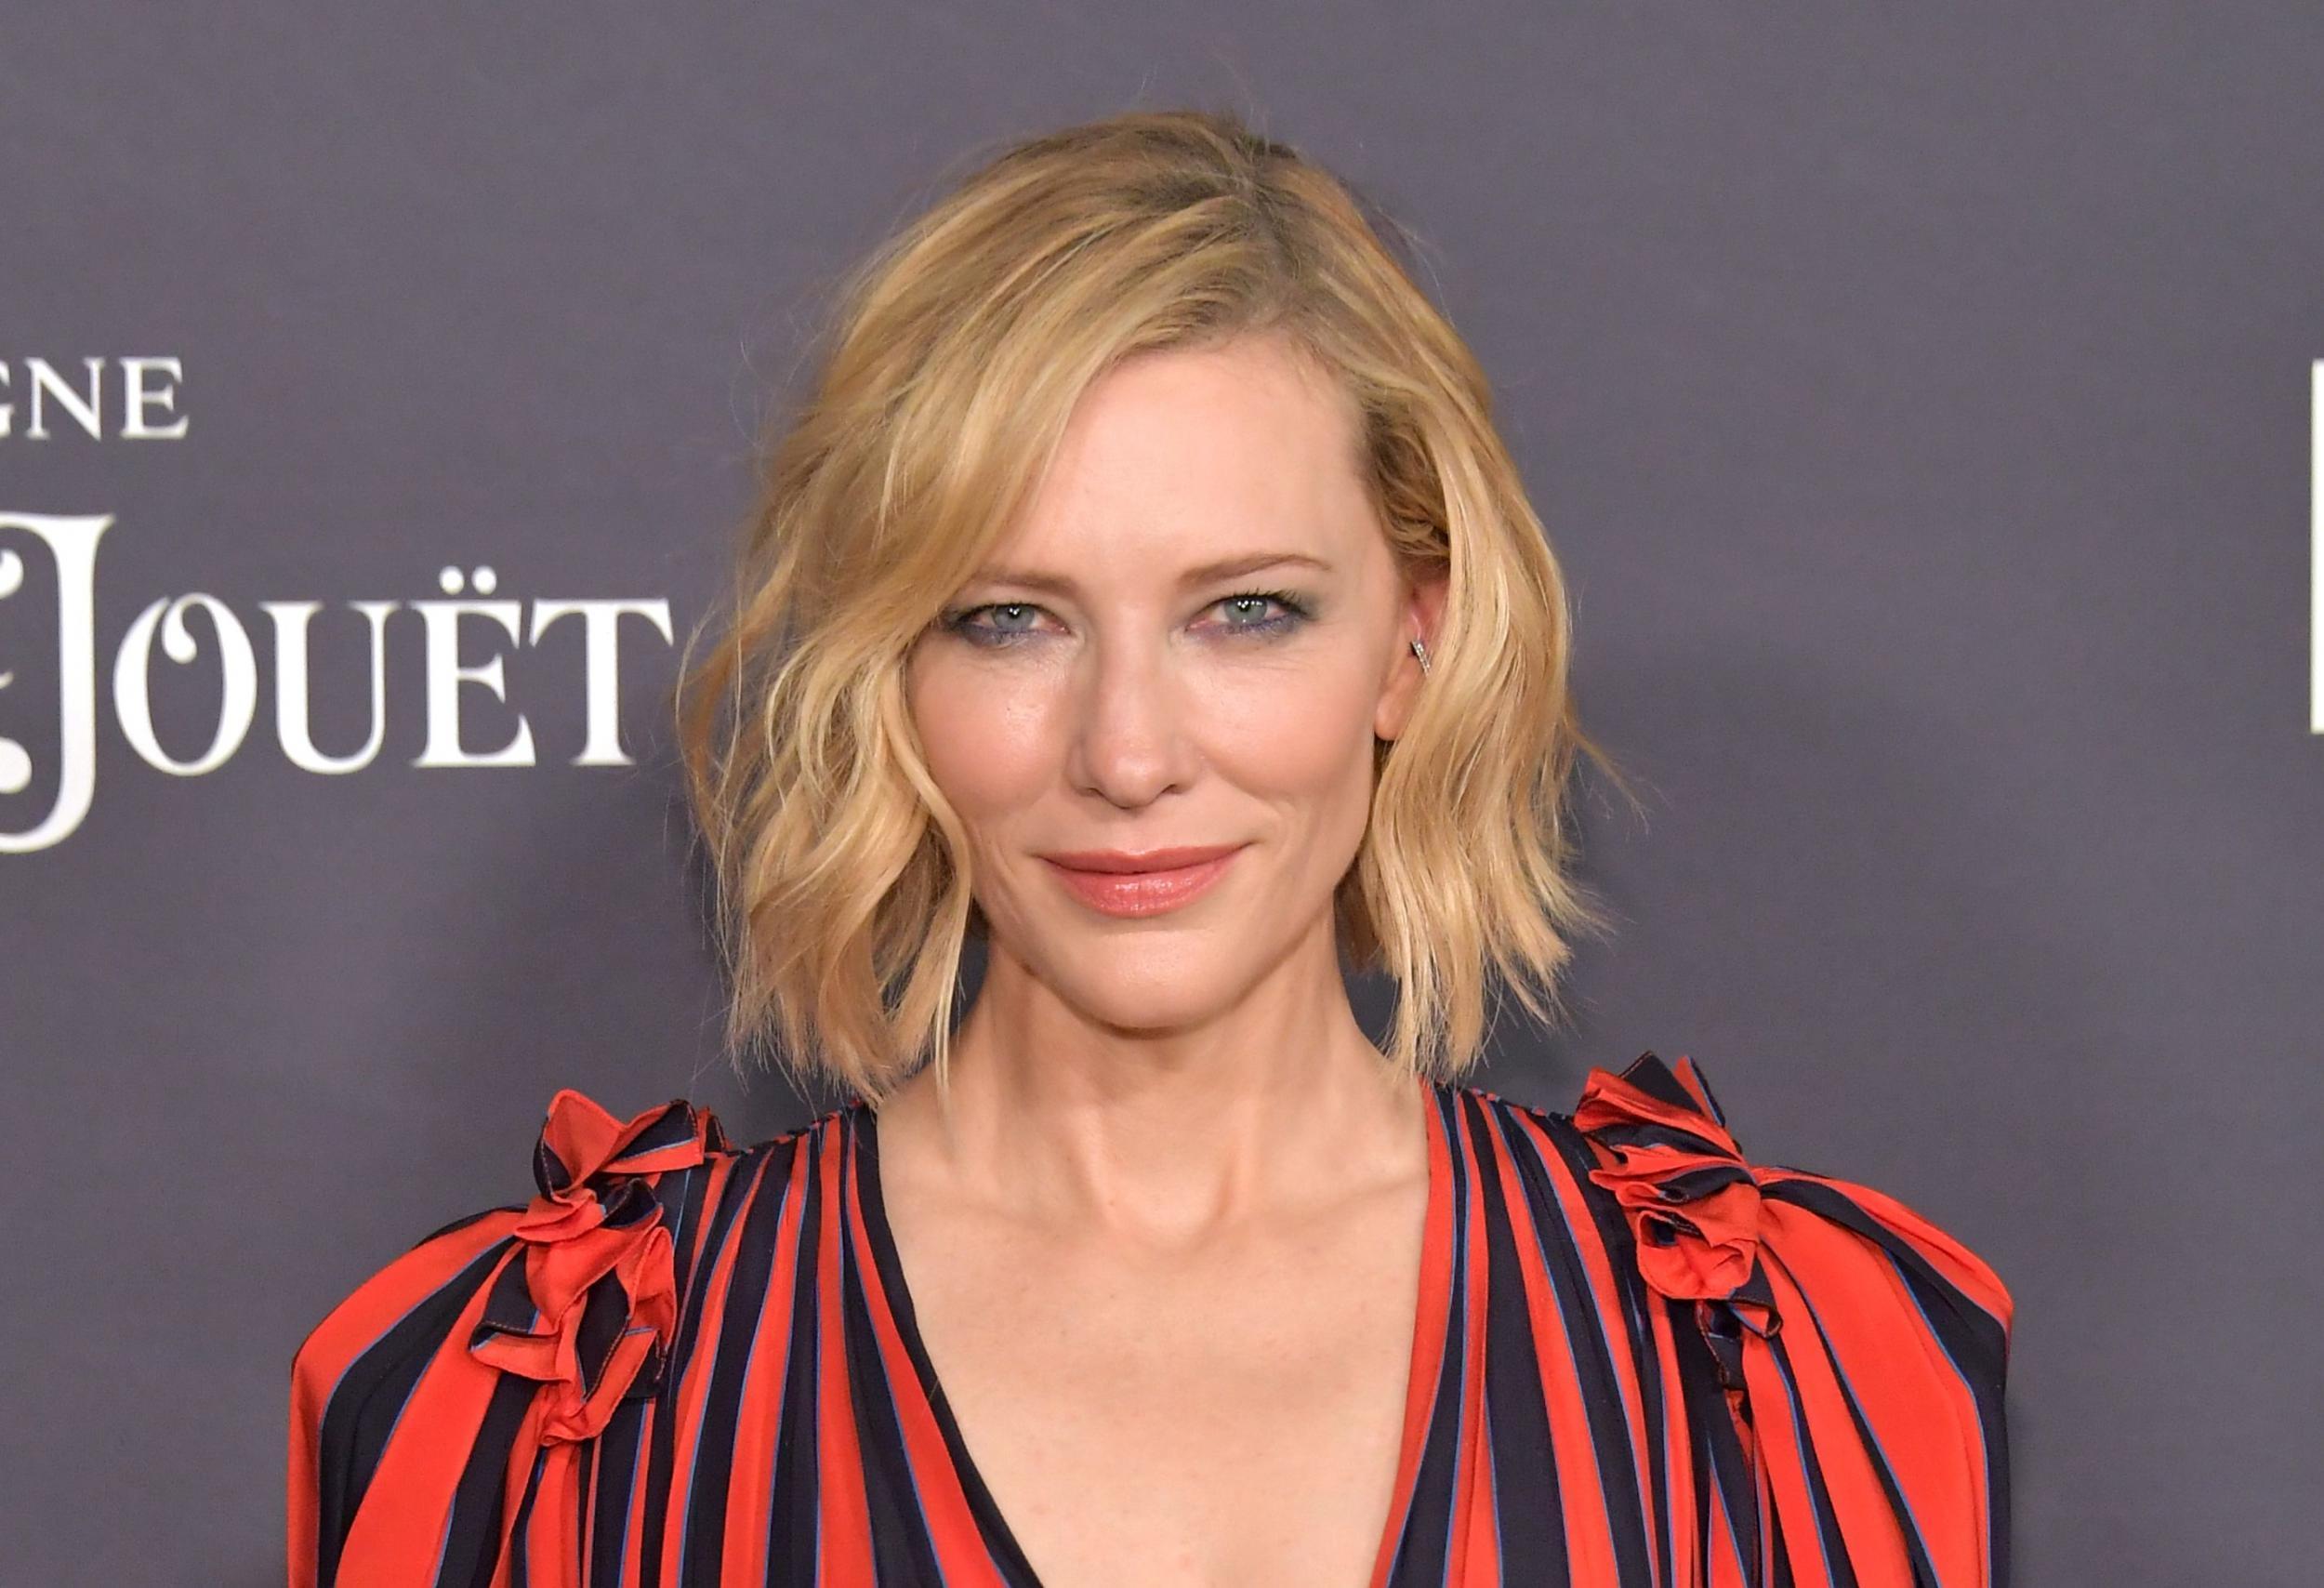 Cate Blanchett nude photos 2019